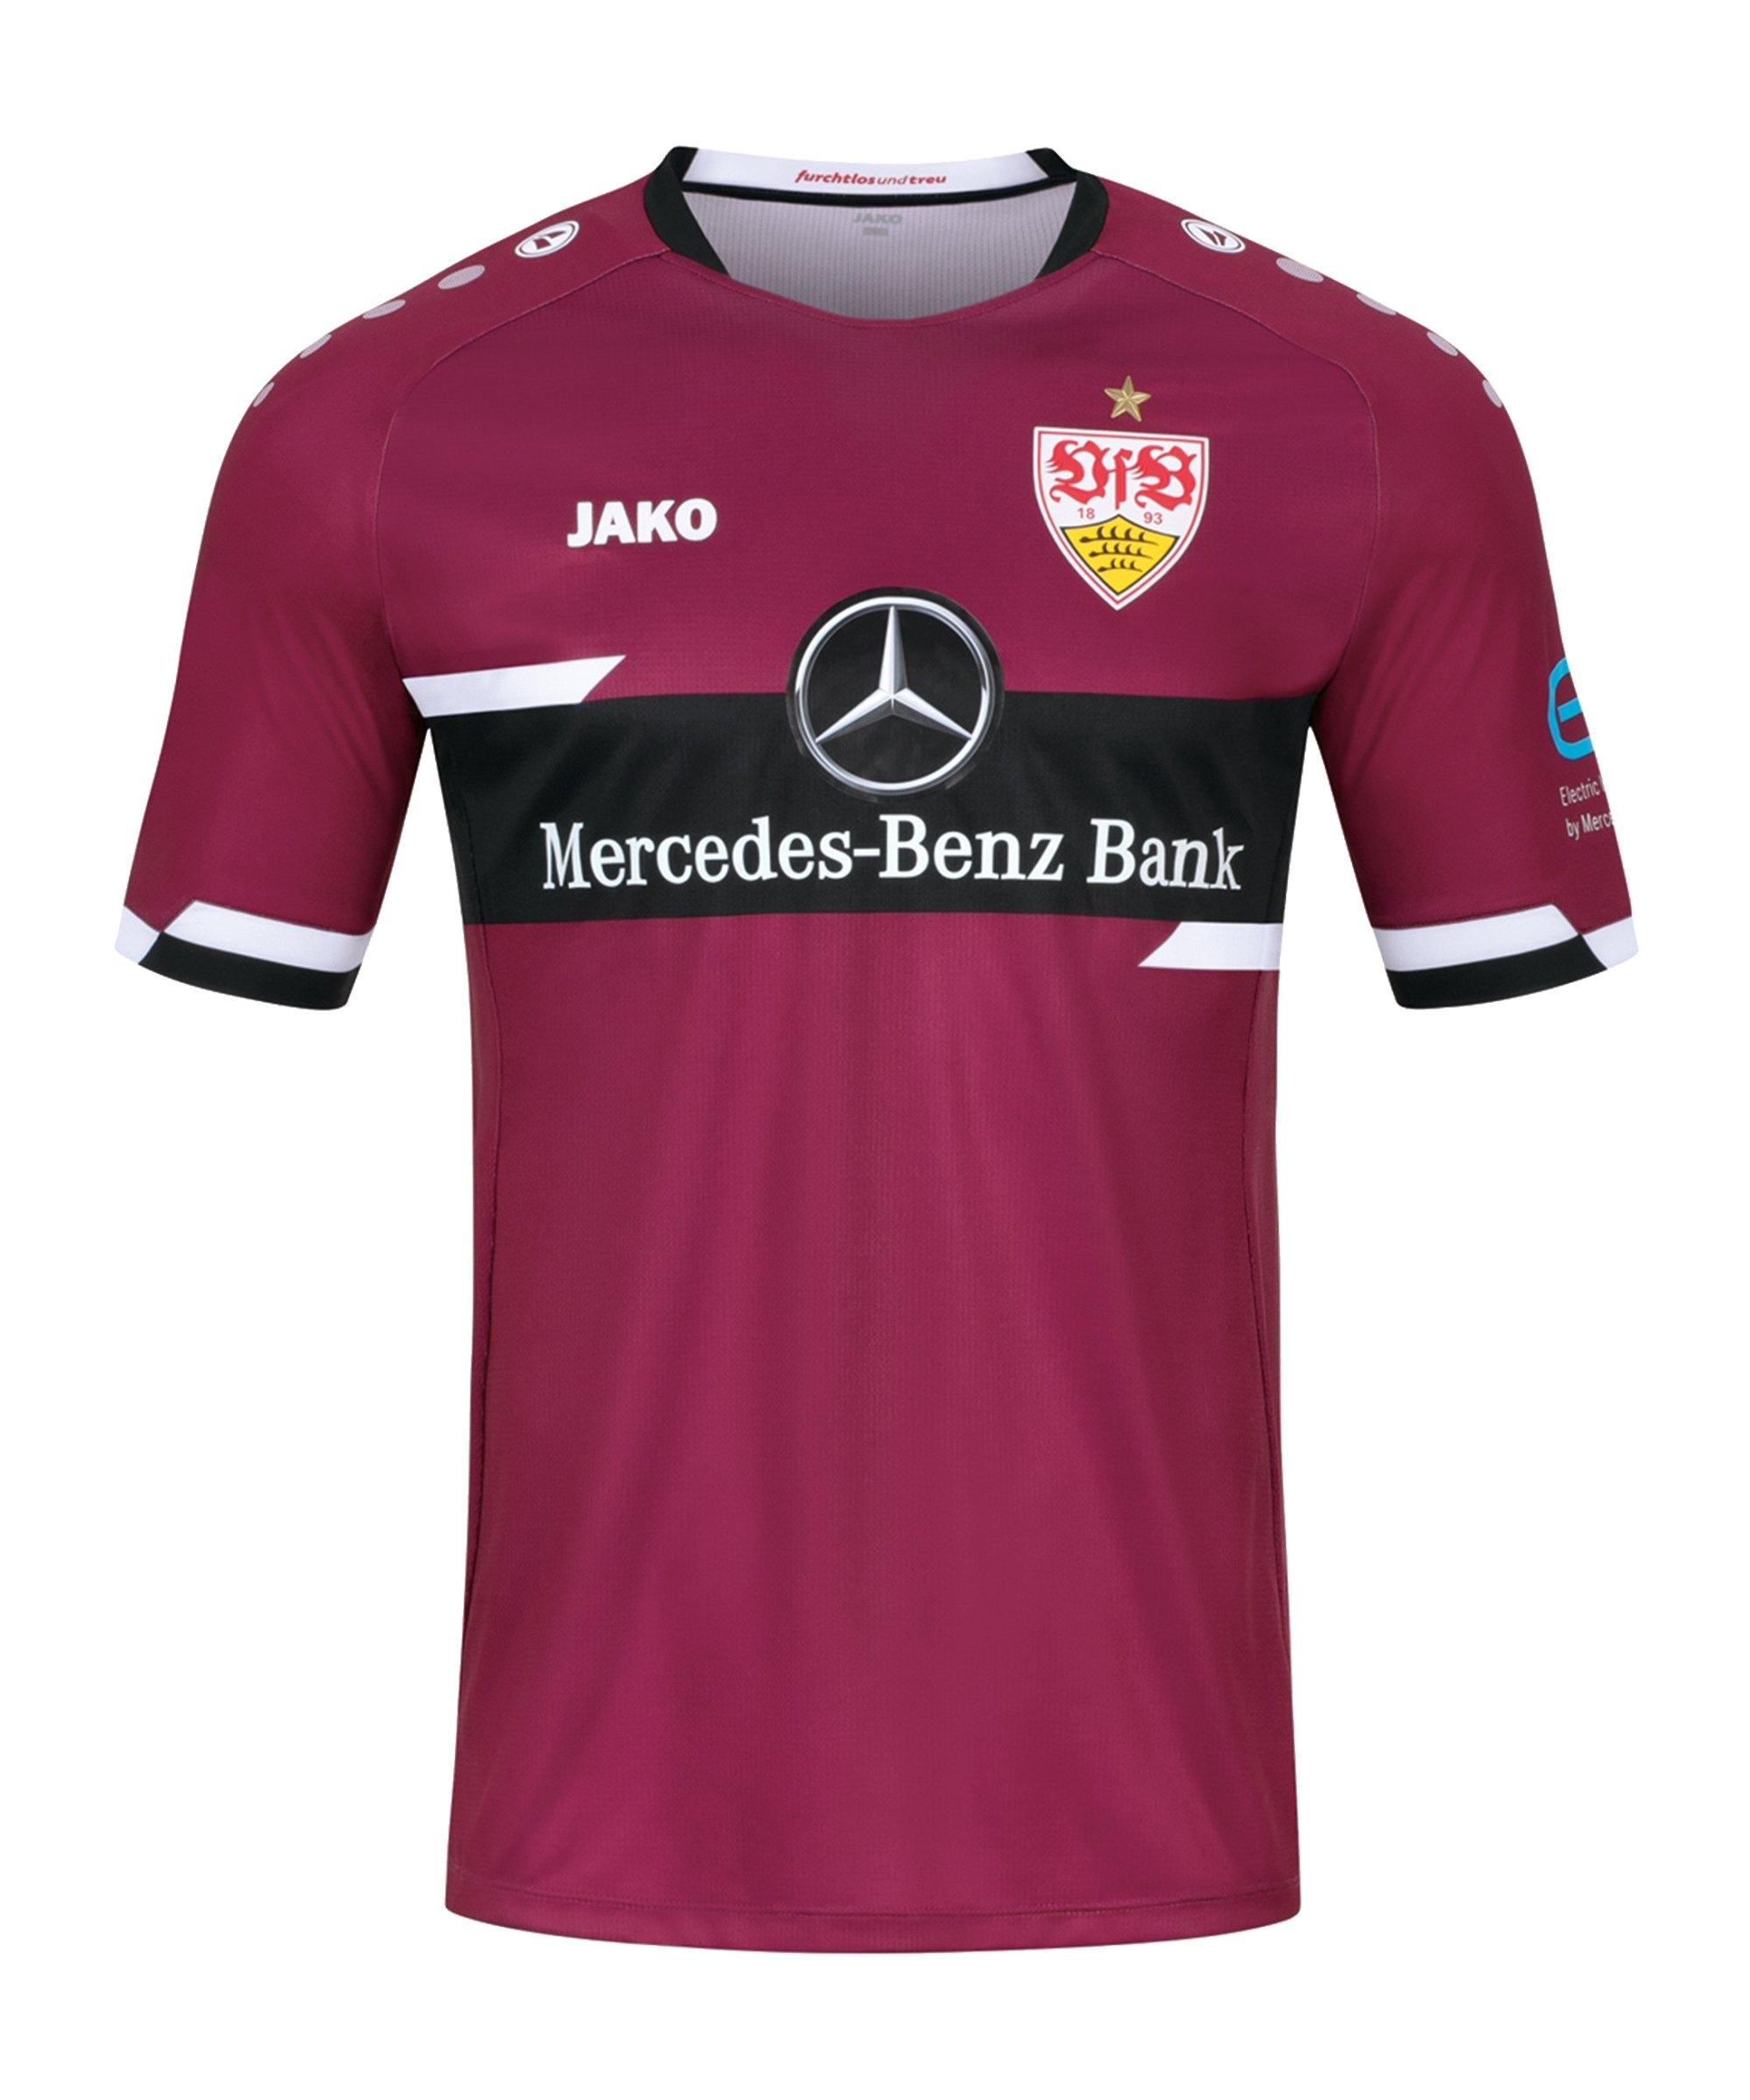 JAKO VfB Stuttgart TW-Trikot Away 2021/2022 Lila F612 - lila